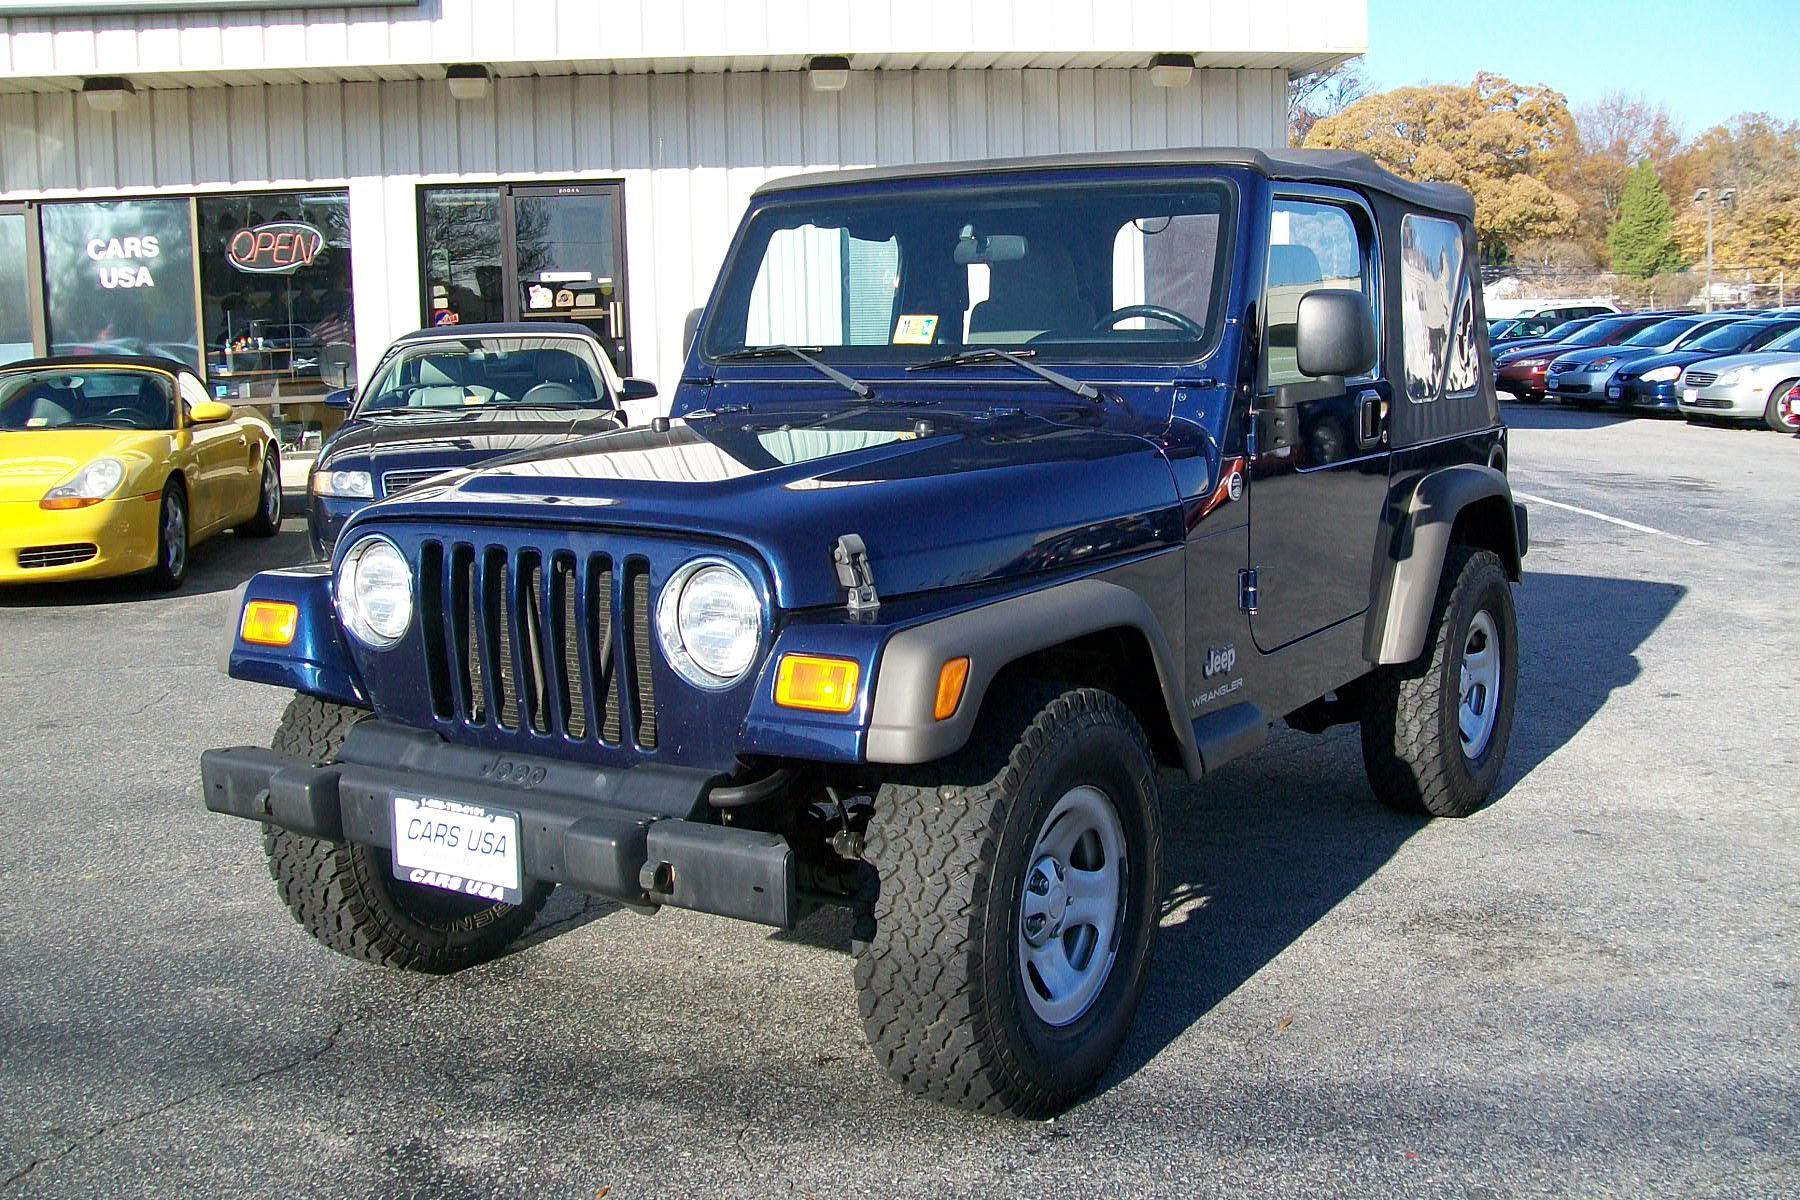 Military Auto Loans Best Cars deals Virginia Beach Oceana Norfolk NOB   2005 Jeep Wrangler X.jpg